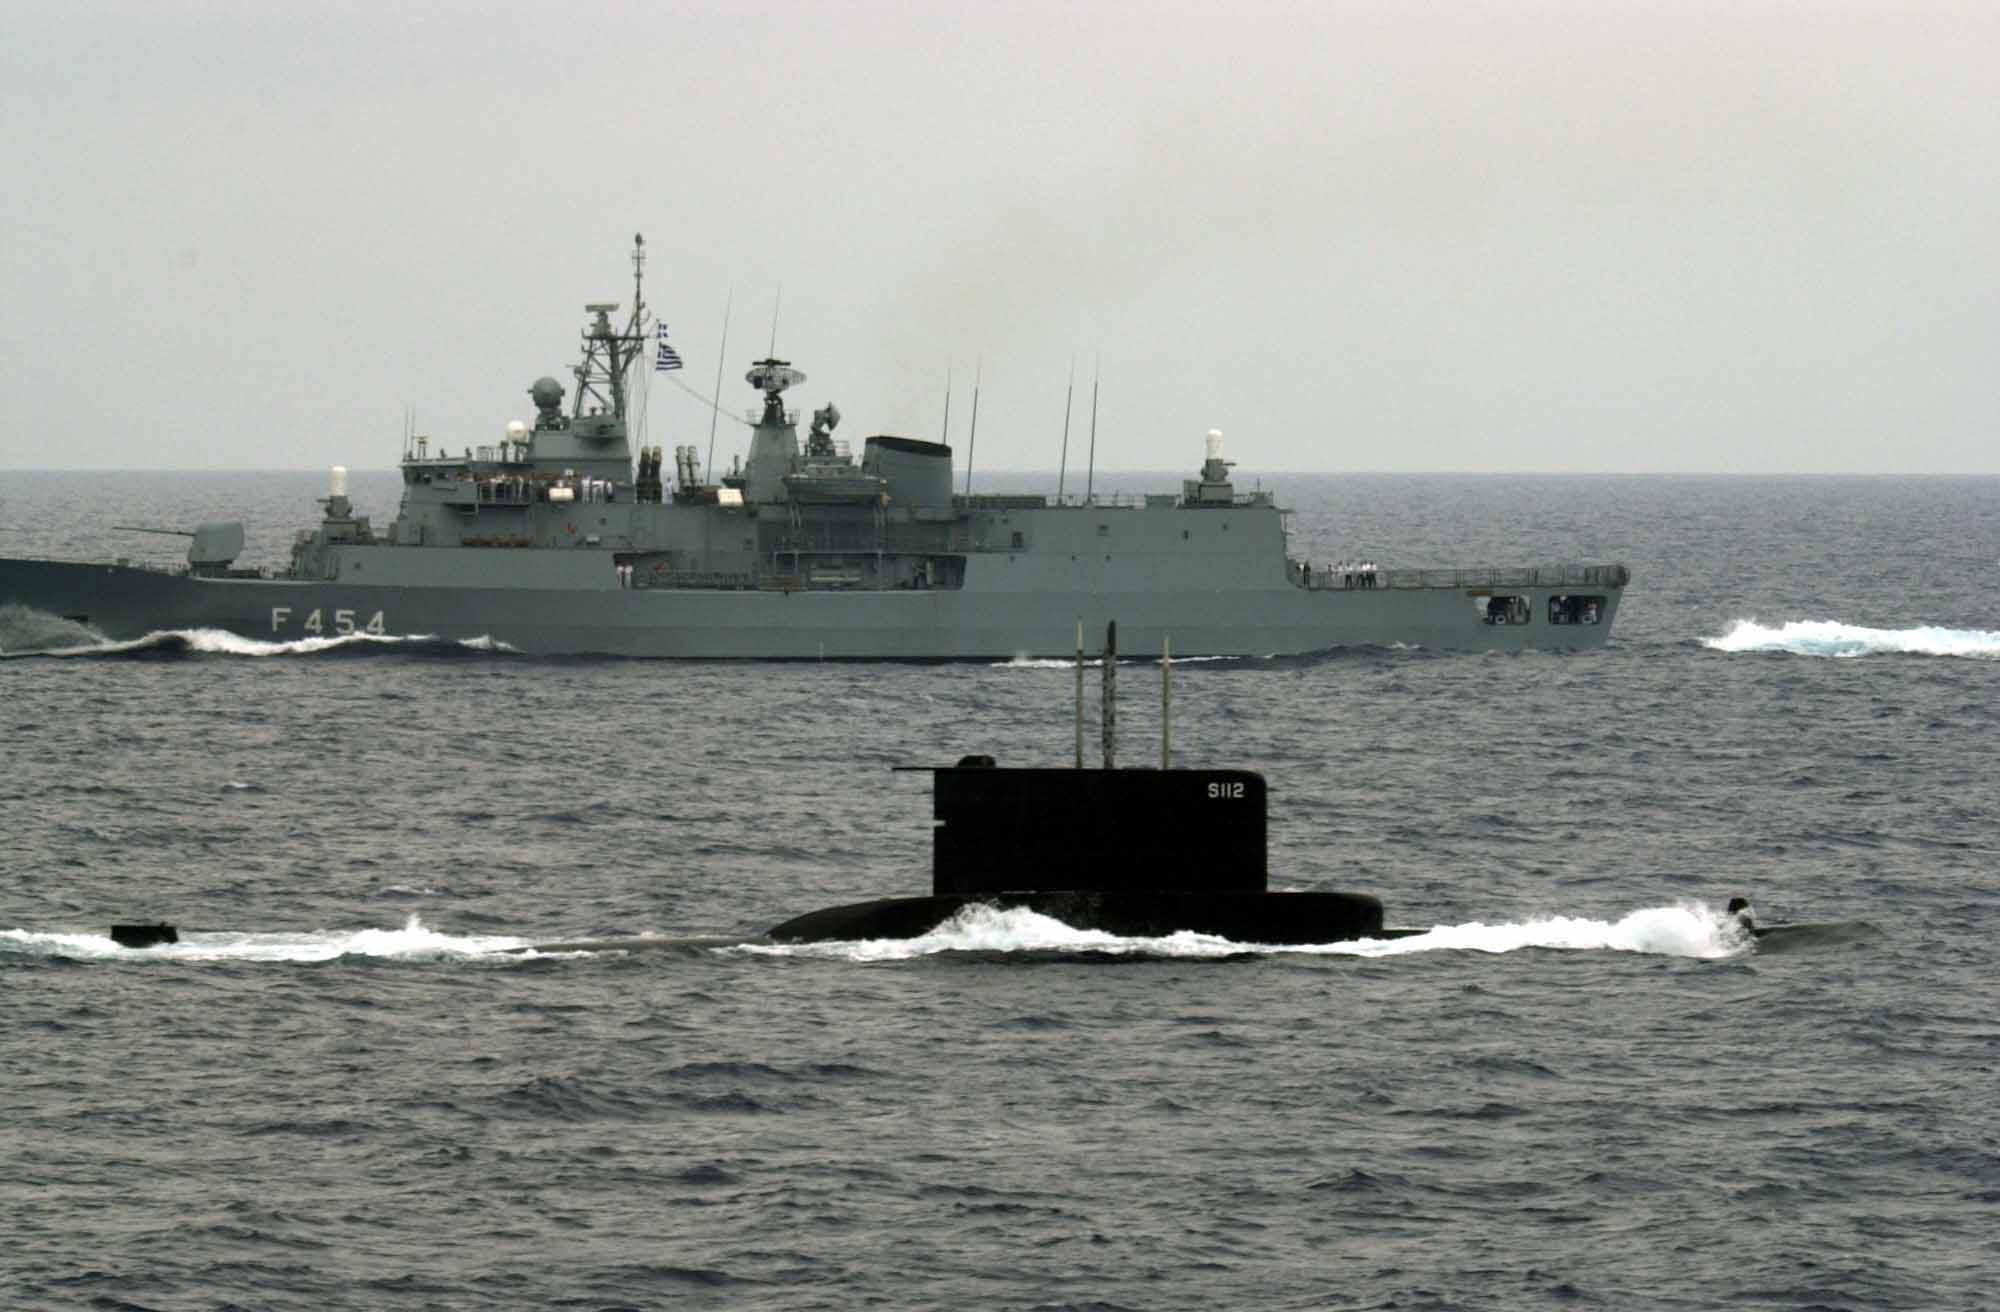 To NATO θέλει διατήρηση της επιχείρησης στο Αιγαίο, ενώ κοιτάει προς Λιβύη   tovima.gr